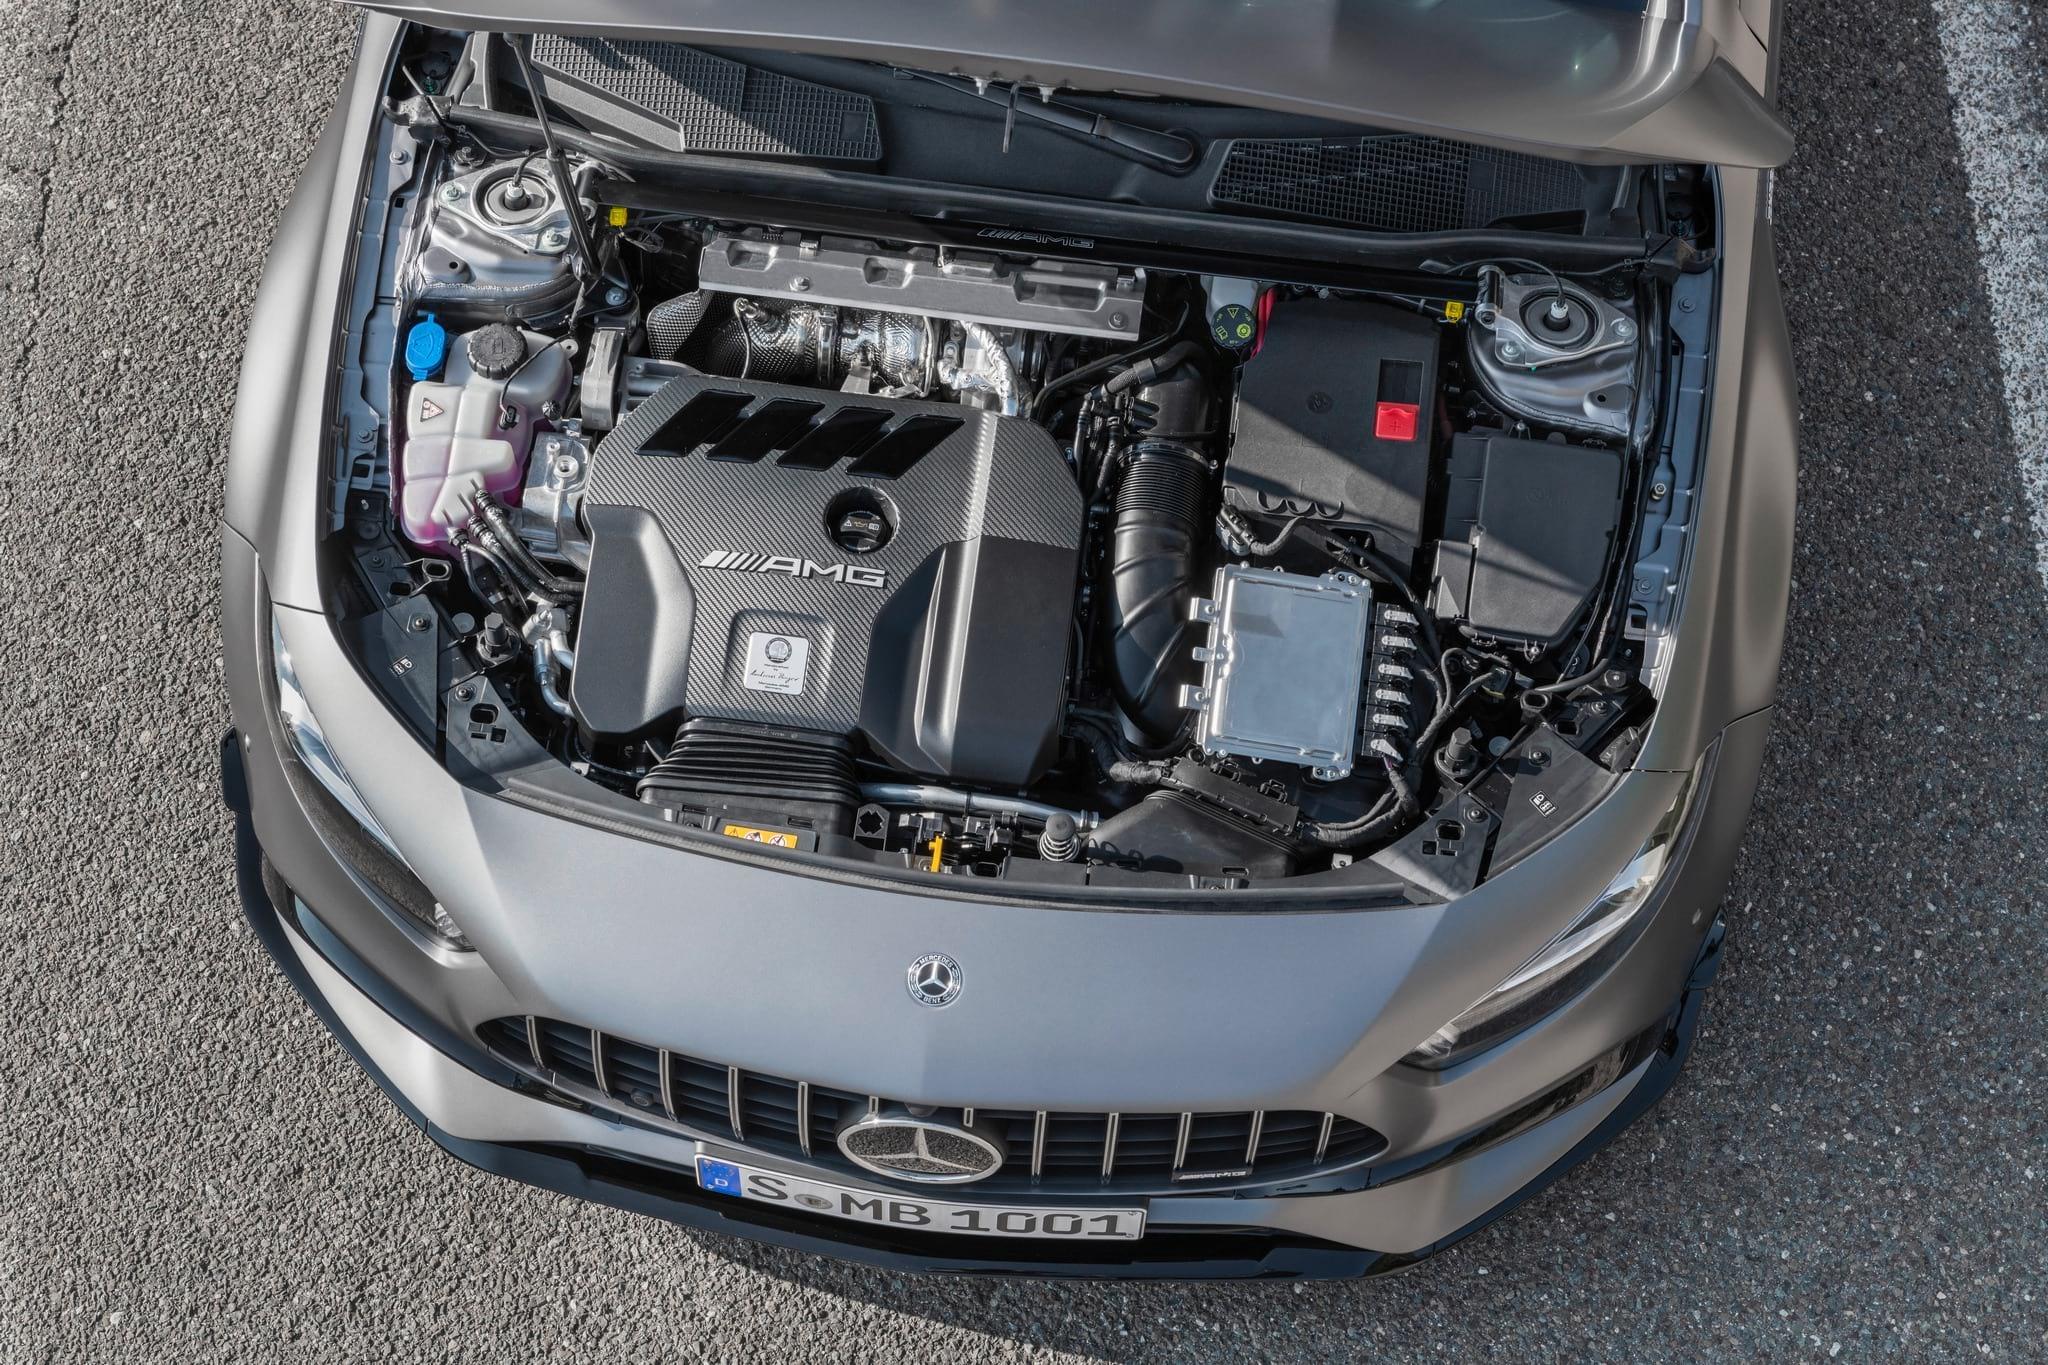 Mercedes–AMG оголосили про поставки перших компактних моделей в 2020 році